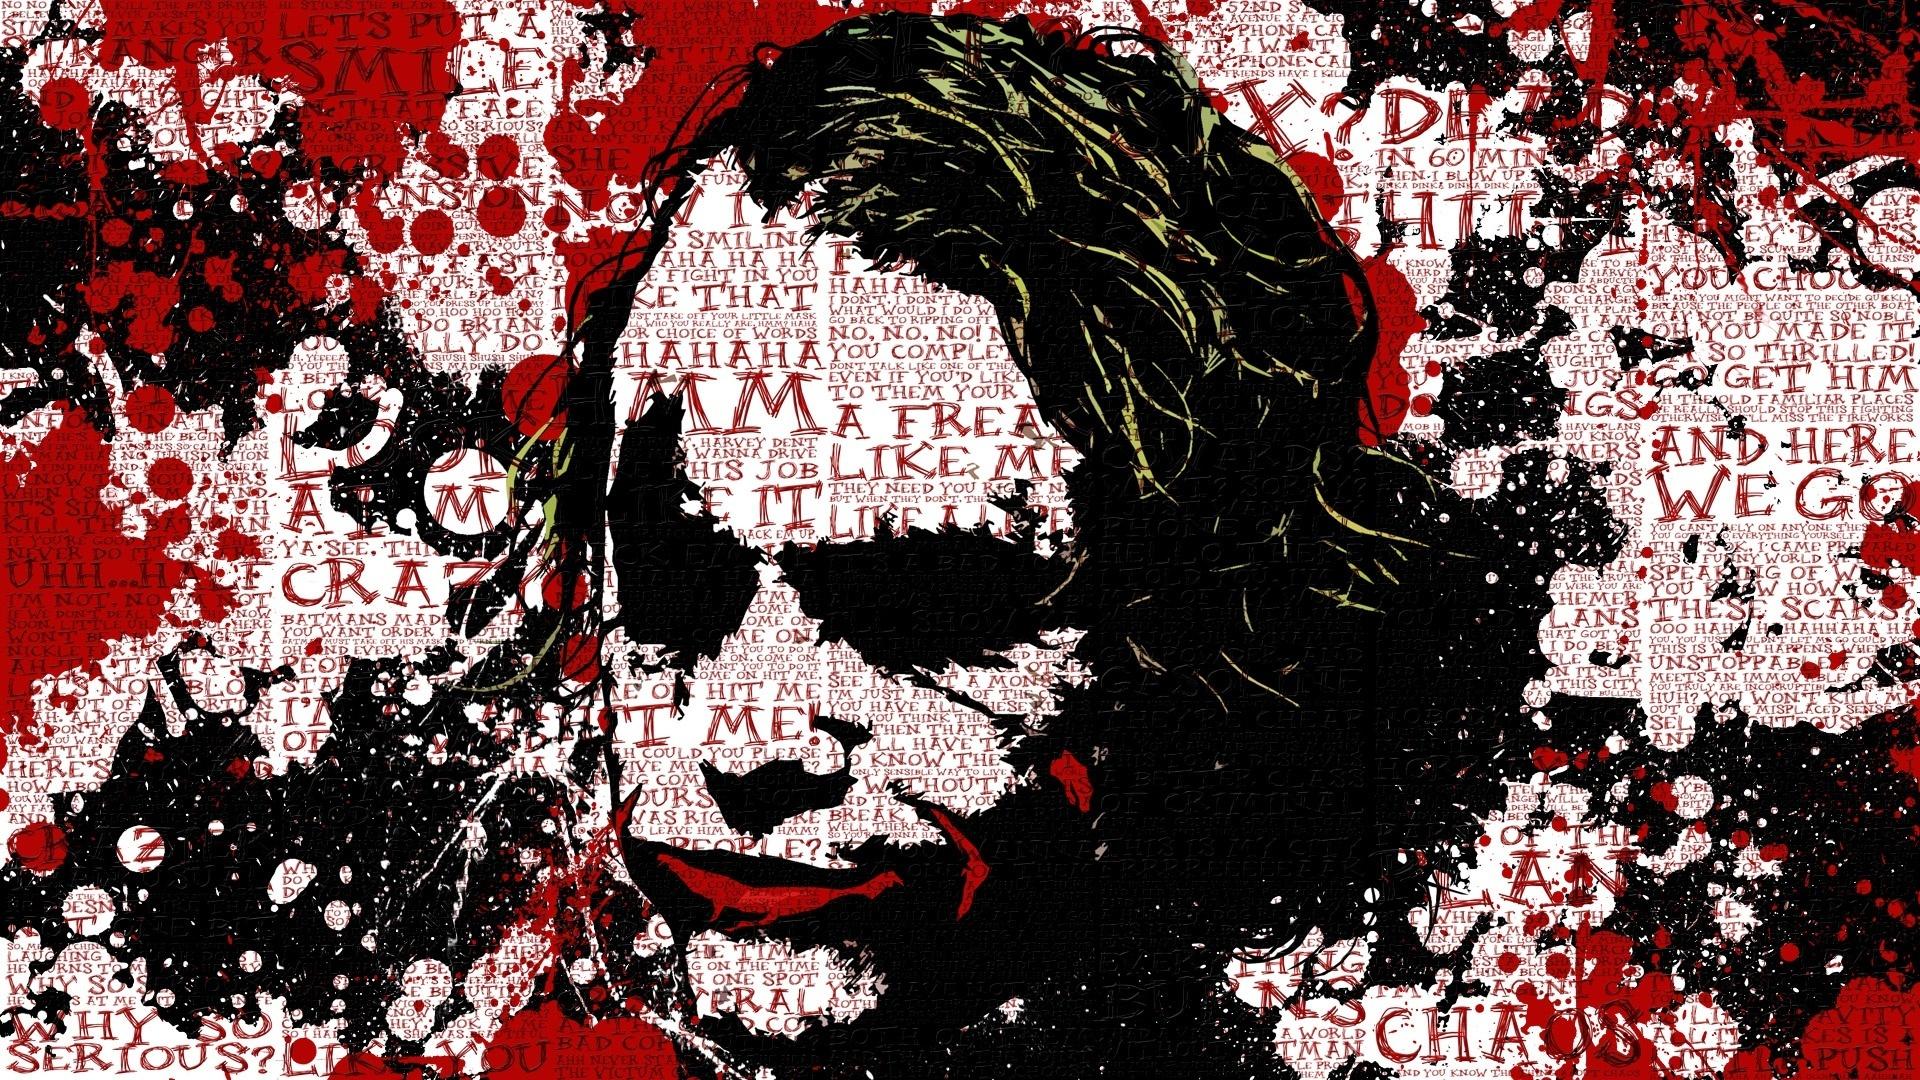 Hd wallpaper of joker - Word Full Hd Wallpaper